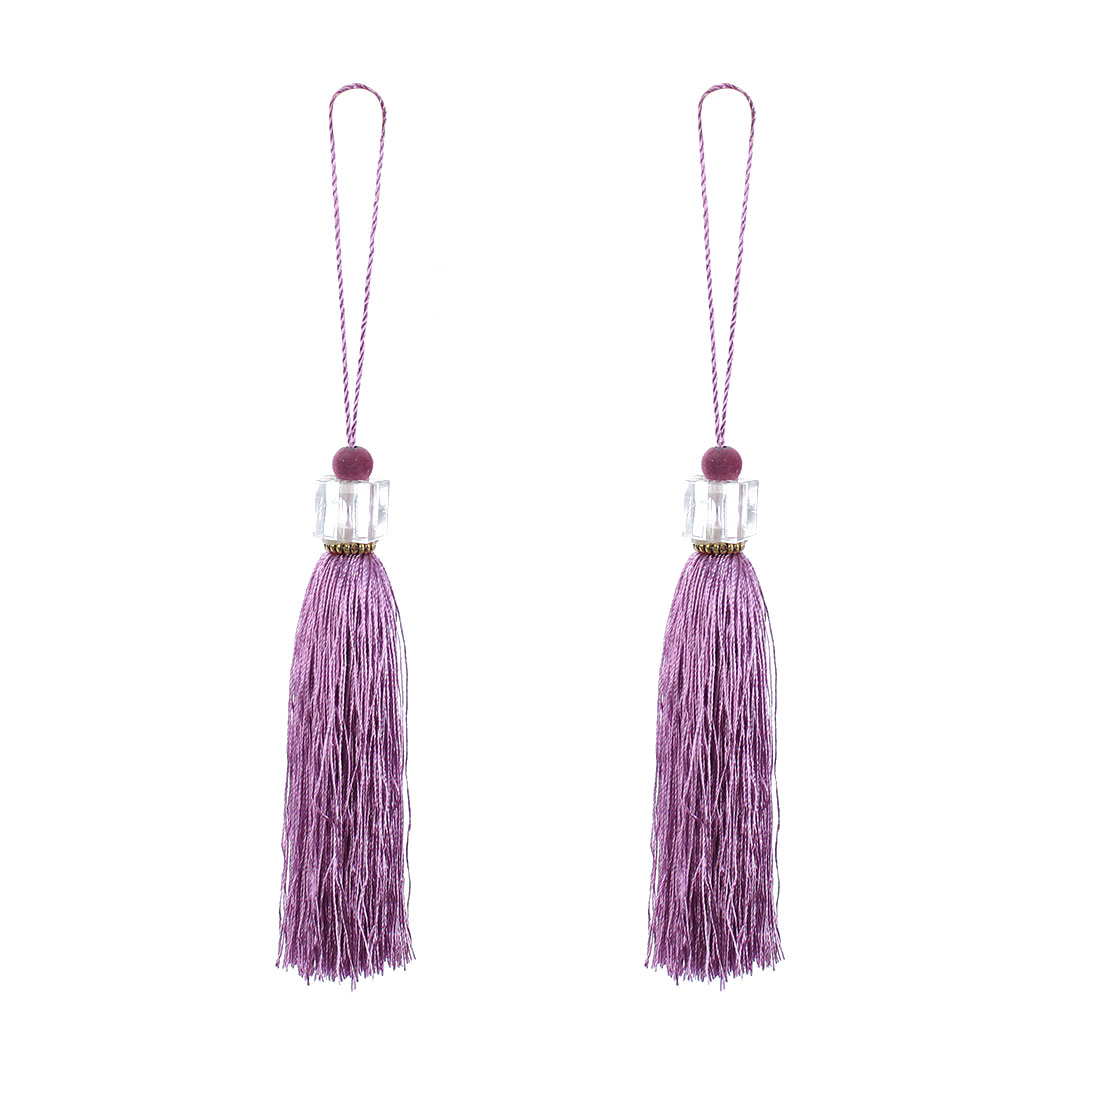 2Pcs Silky Tassels Pendant Sewing DIY Craft Supply Curtain Drapery Deco Light Purple